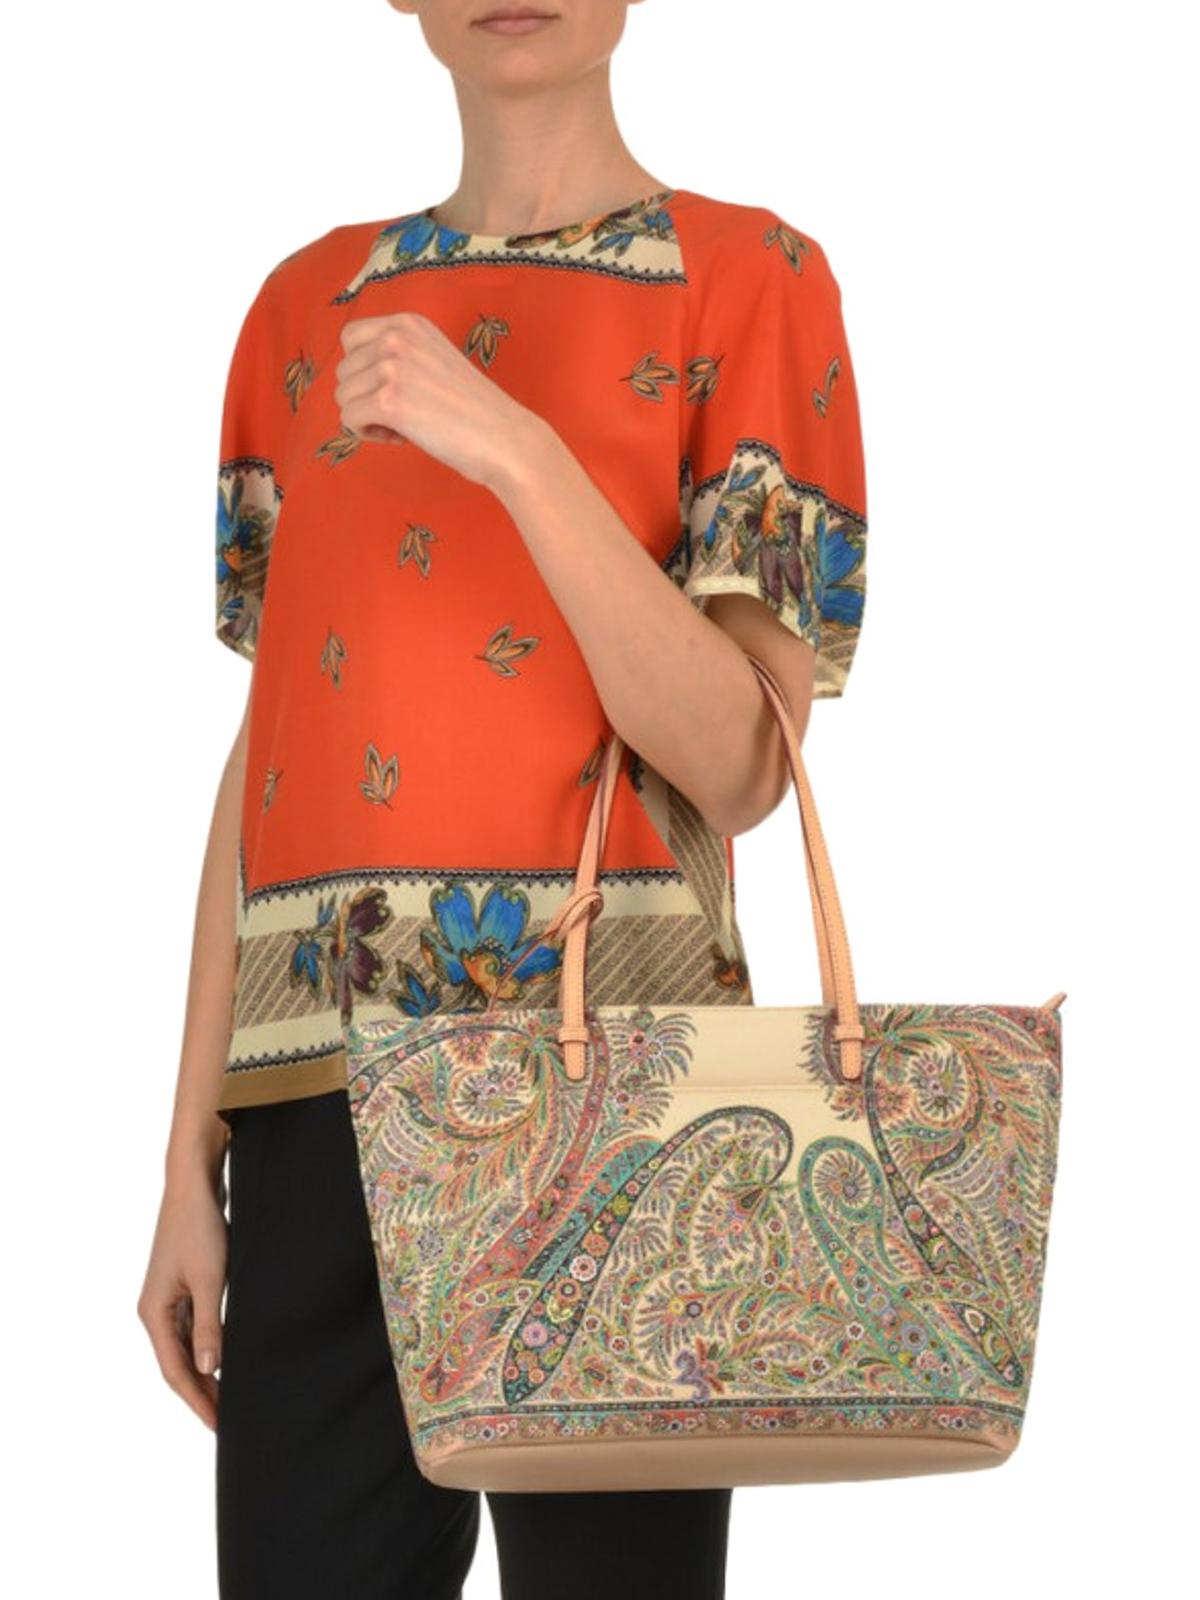 separation shoes 9fbd2 24d77 Etro - Floral Paisley shopping bag - totes bags - 1G61922818000